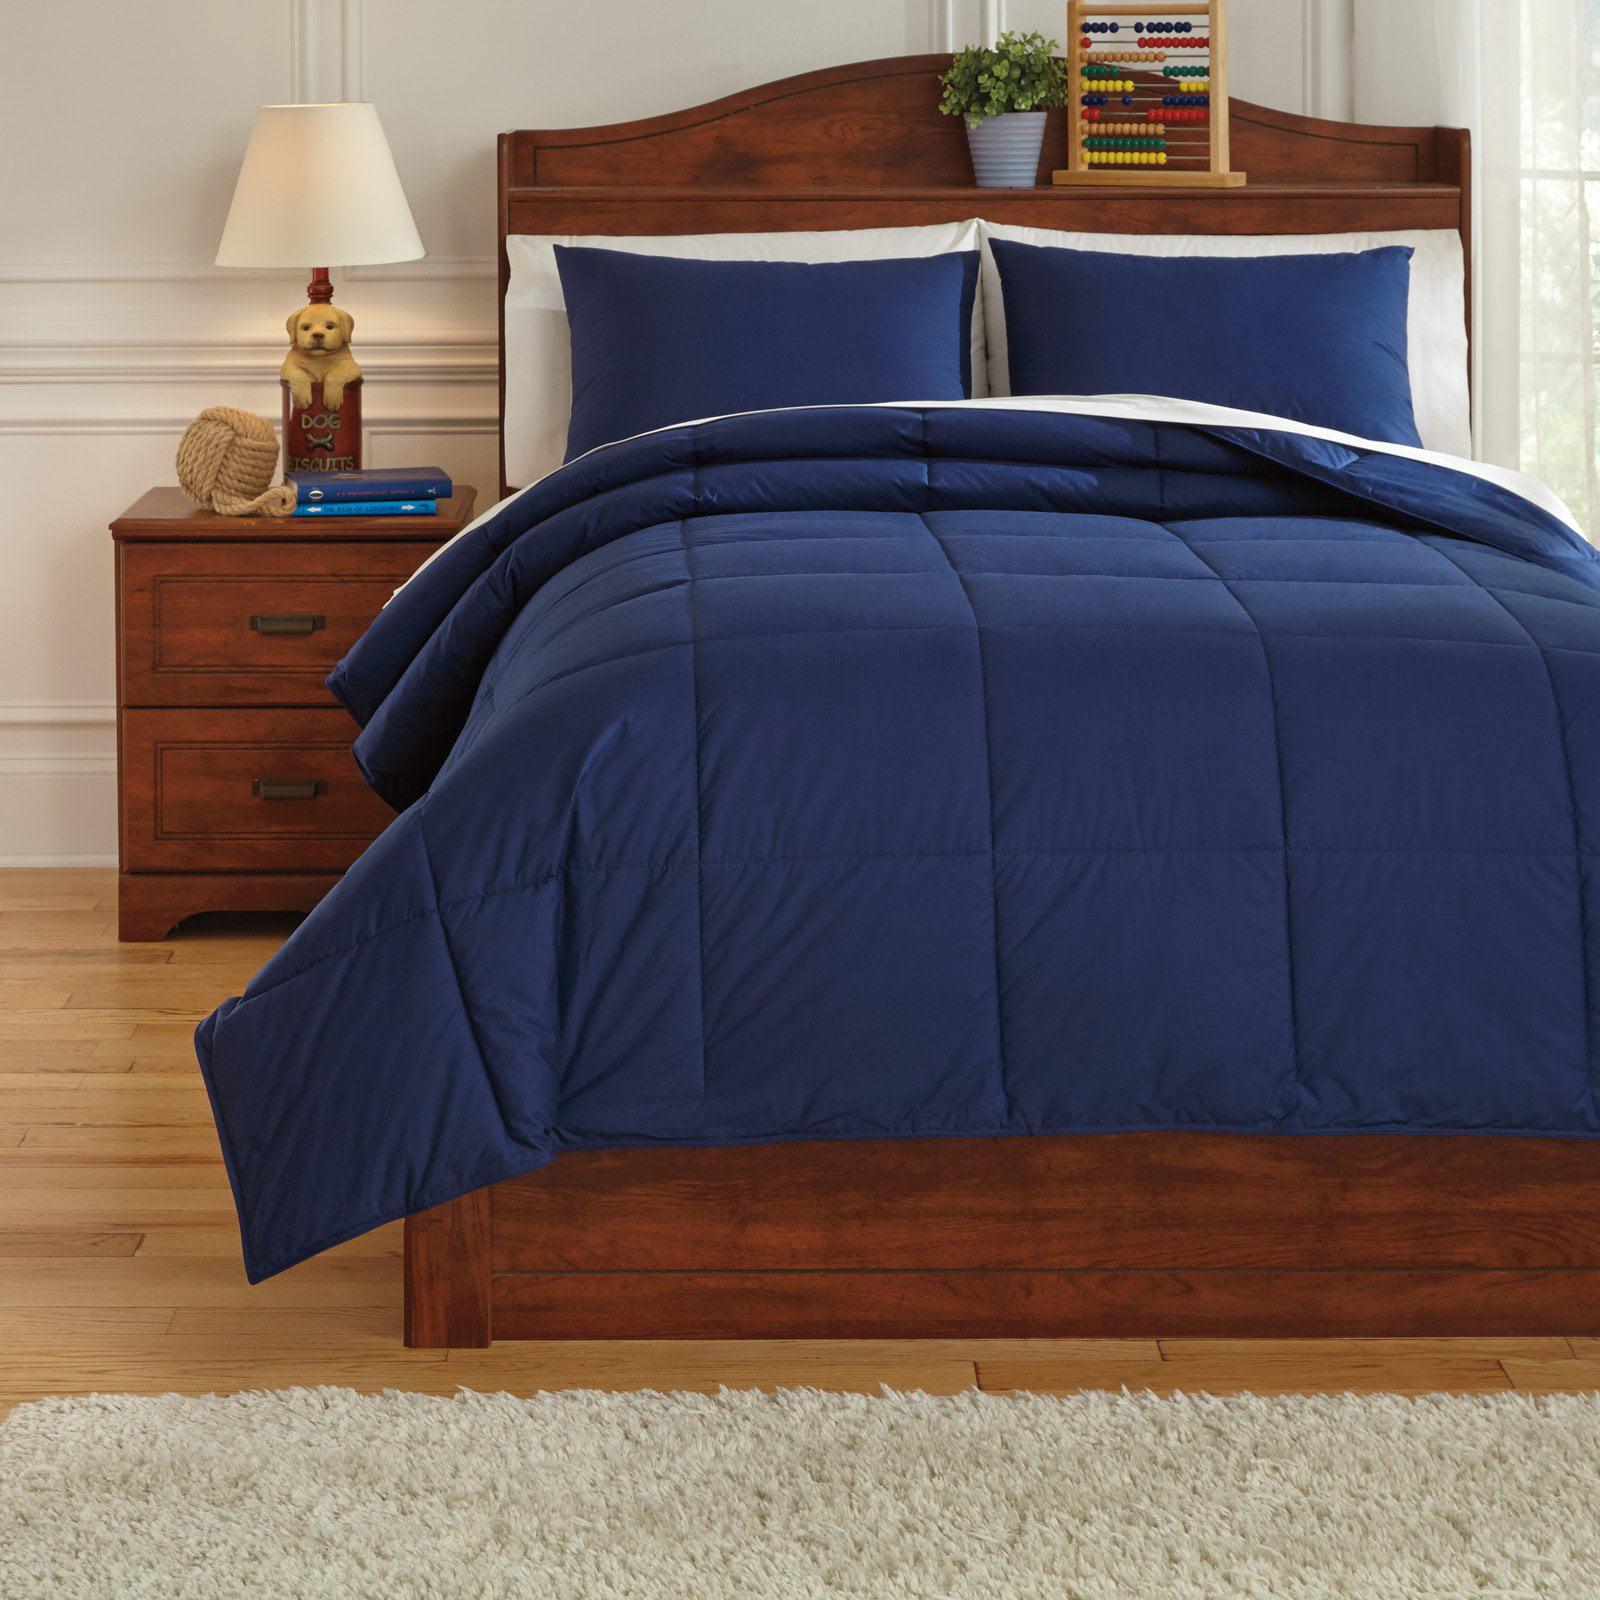 Plainfield Comforter Set by Signature Design by Ashley